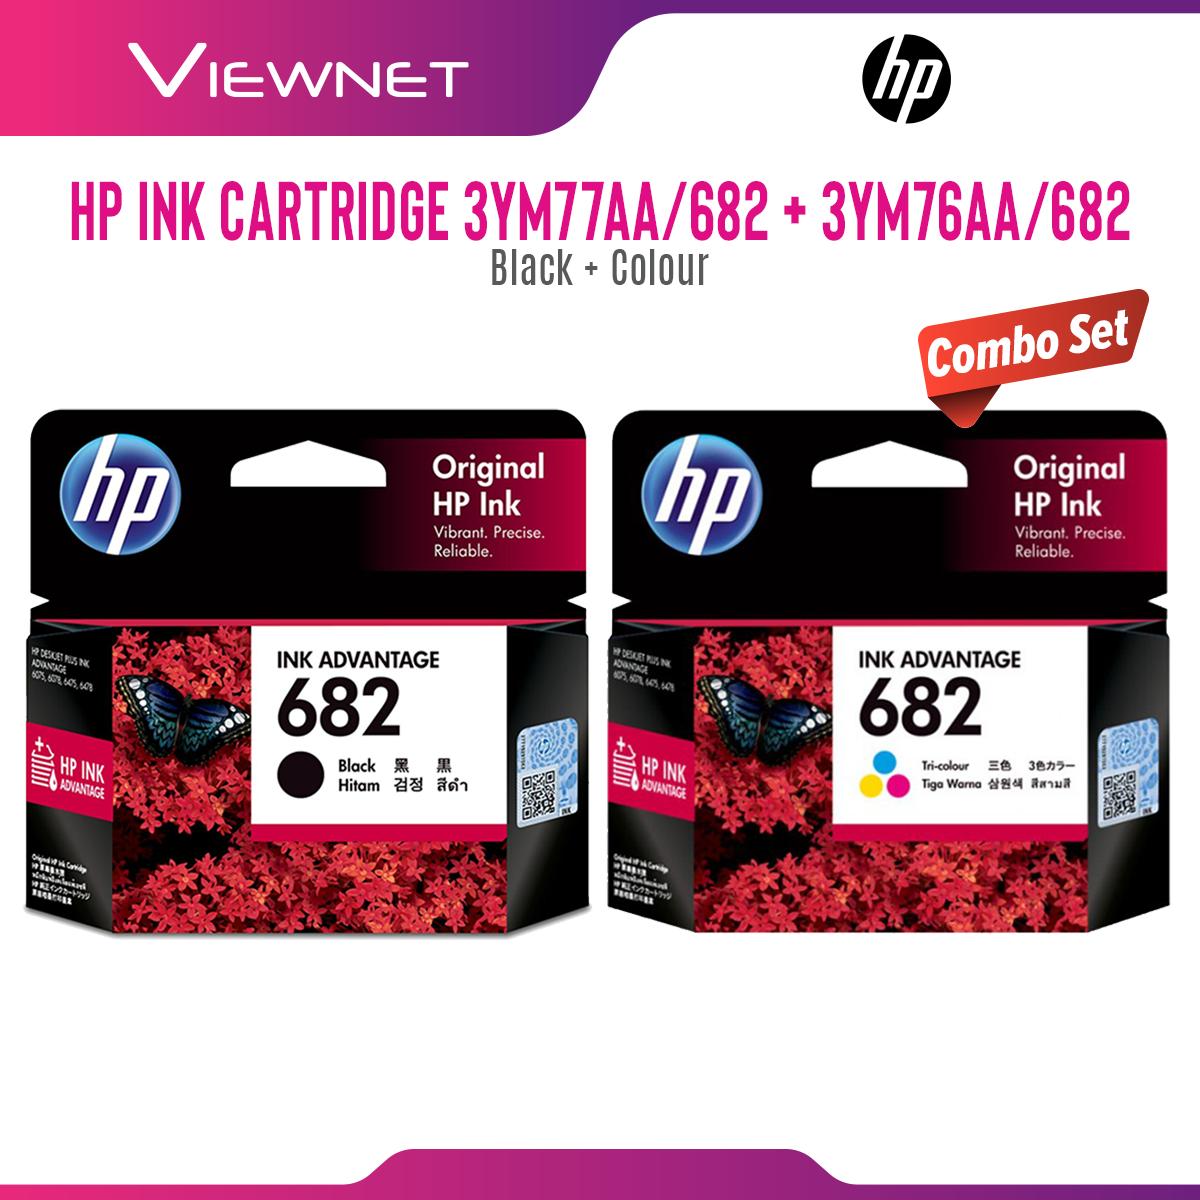 HP 682 Tri-Colour (3YM76AA/682) / Black (3YM77AA/682) Original Ink Advantage Cartridge